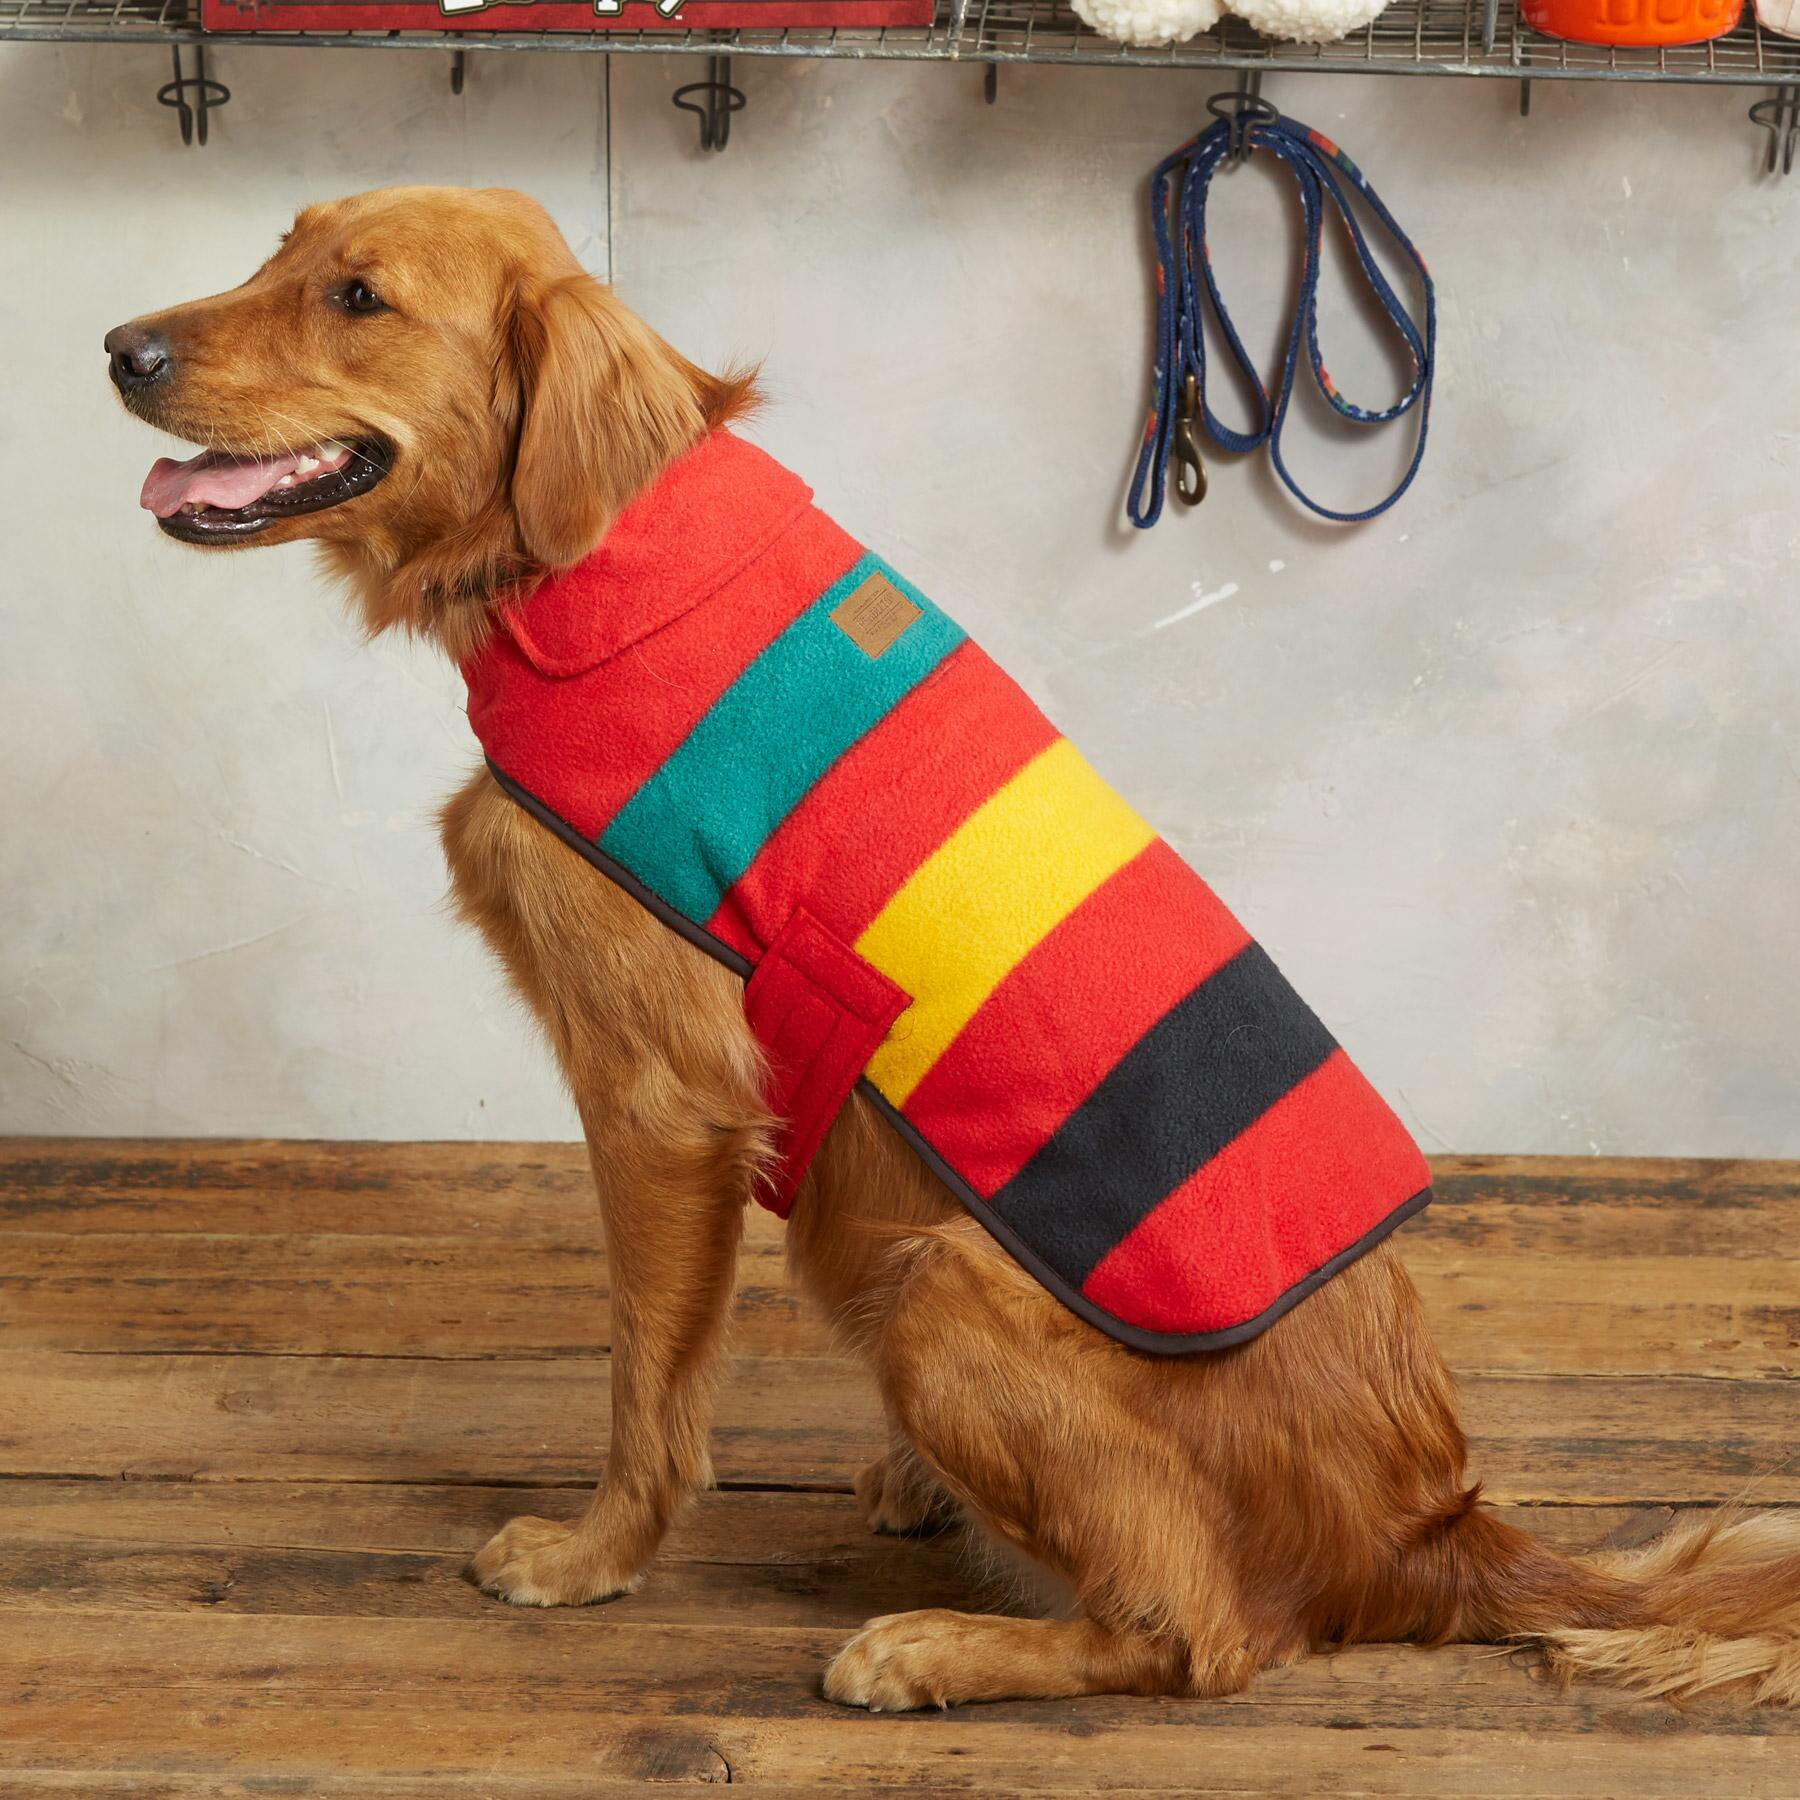 Pendleton National Parks Dog Coat